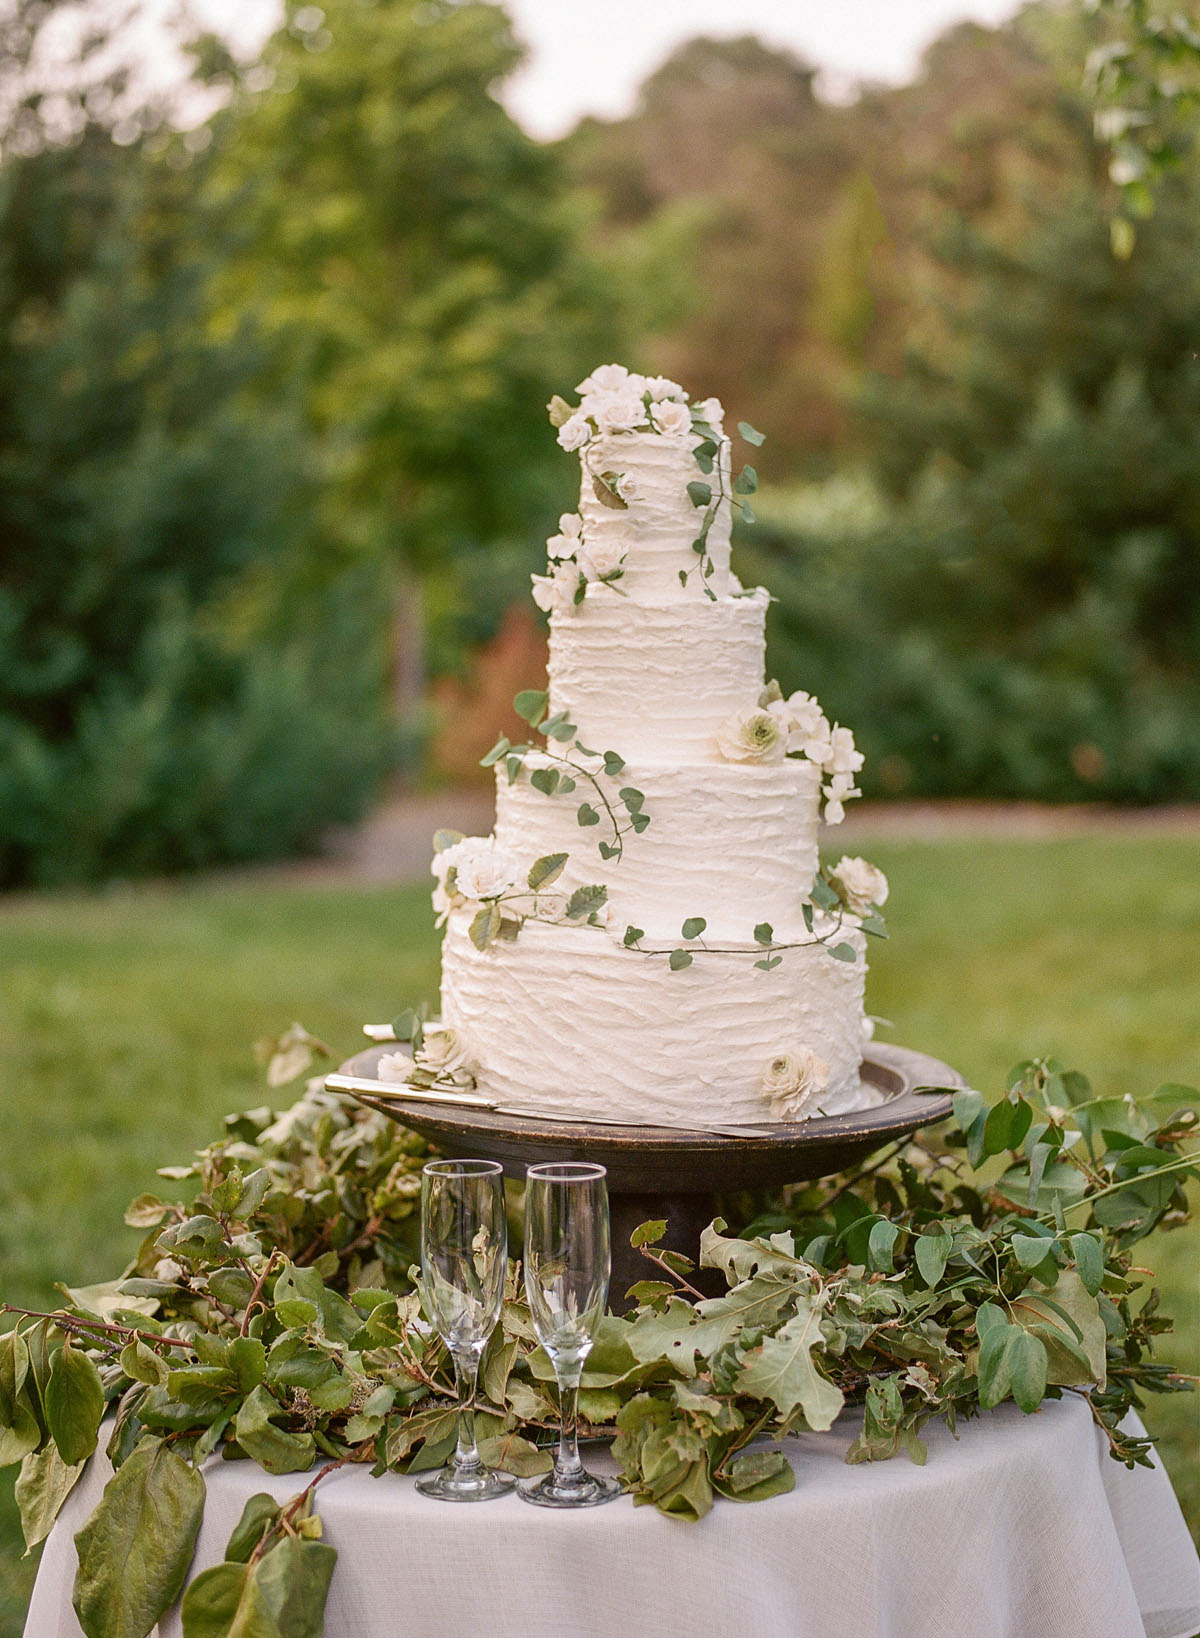 33-rustic-wedding-cake-greenery.jpg